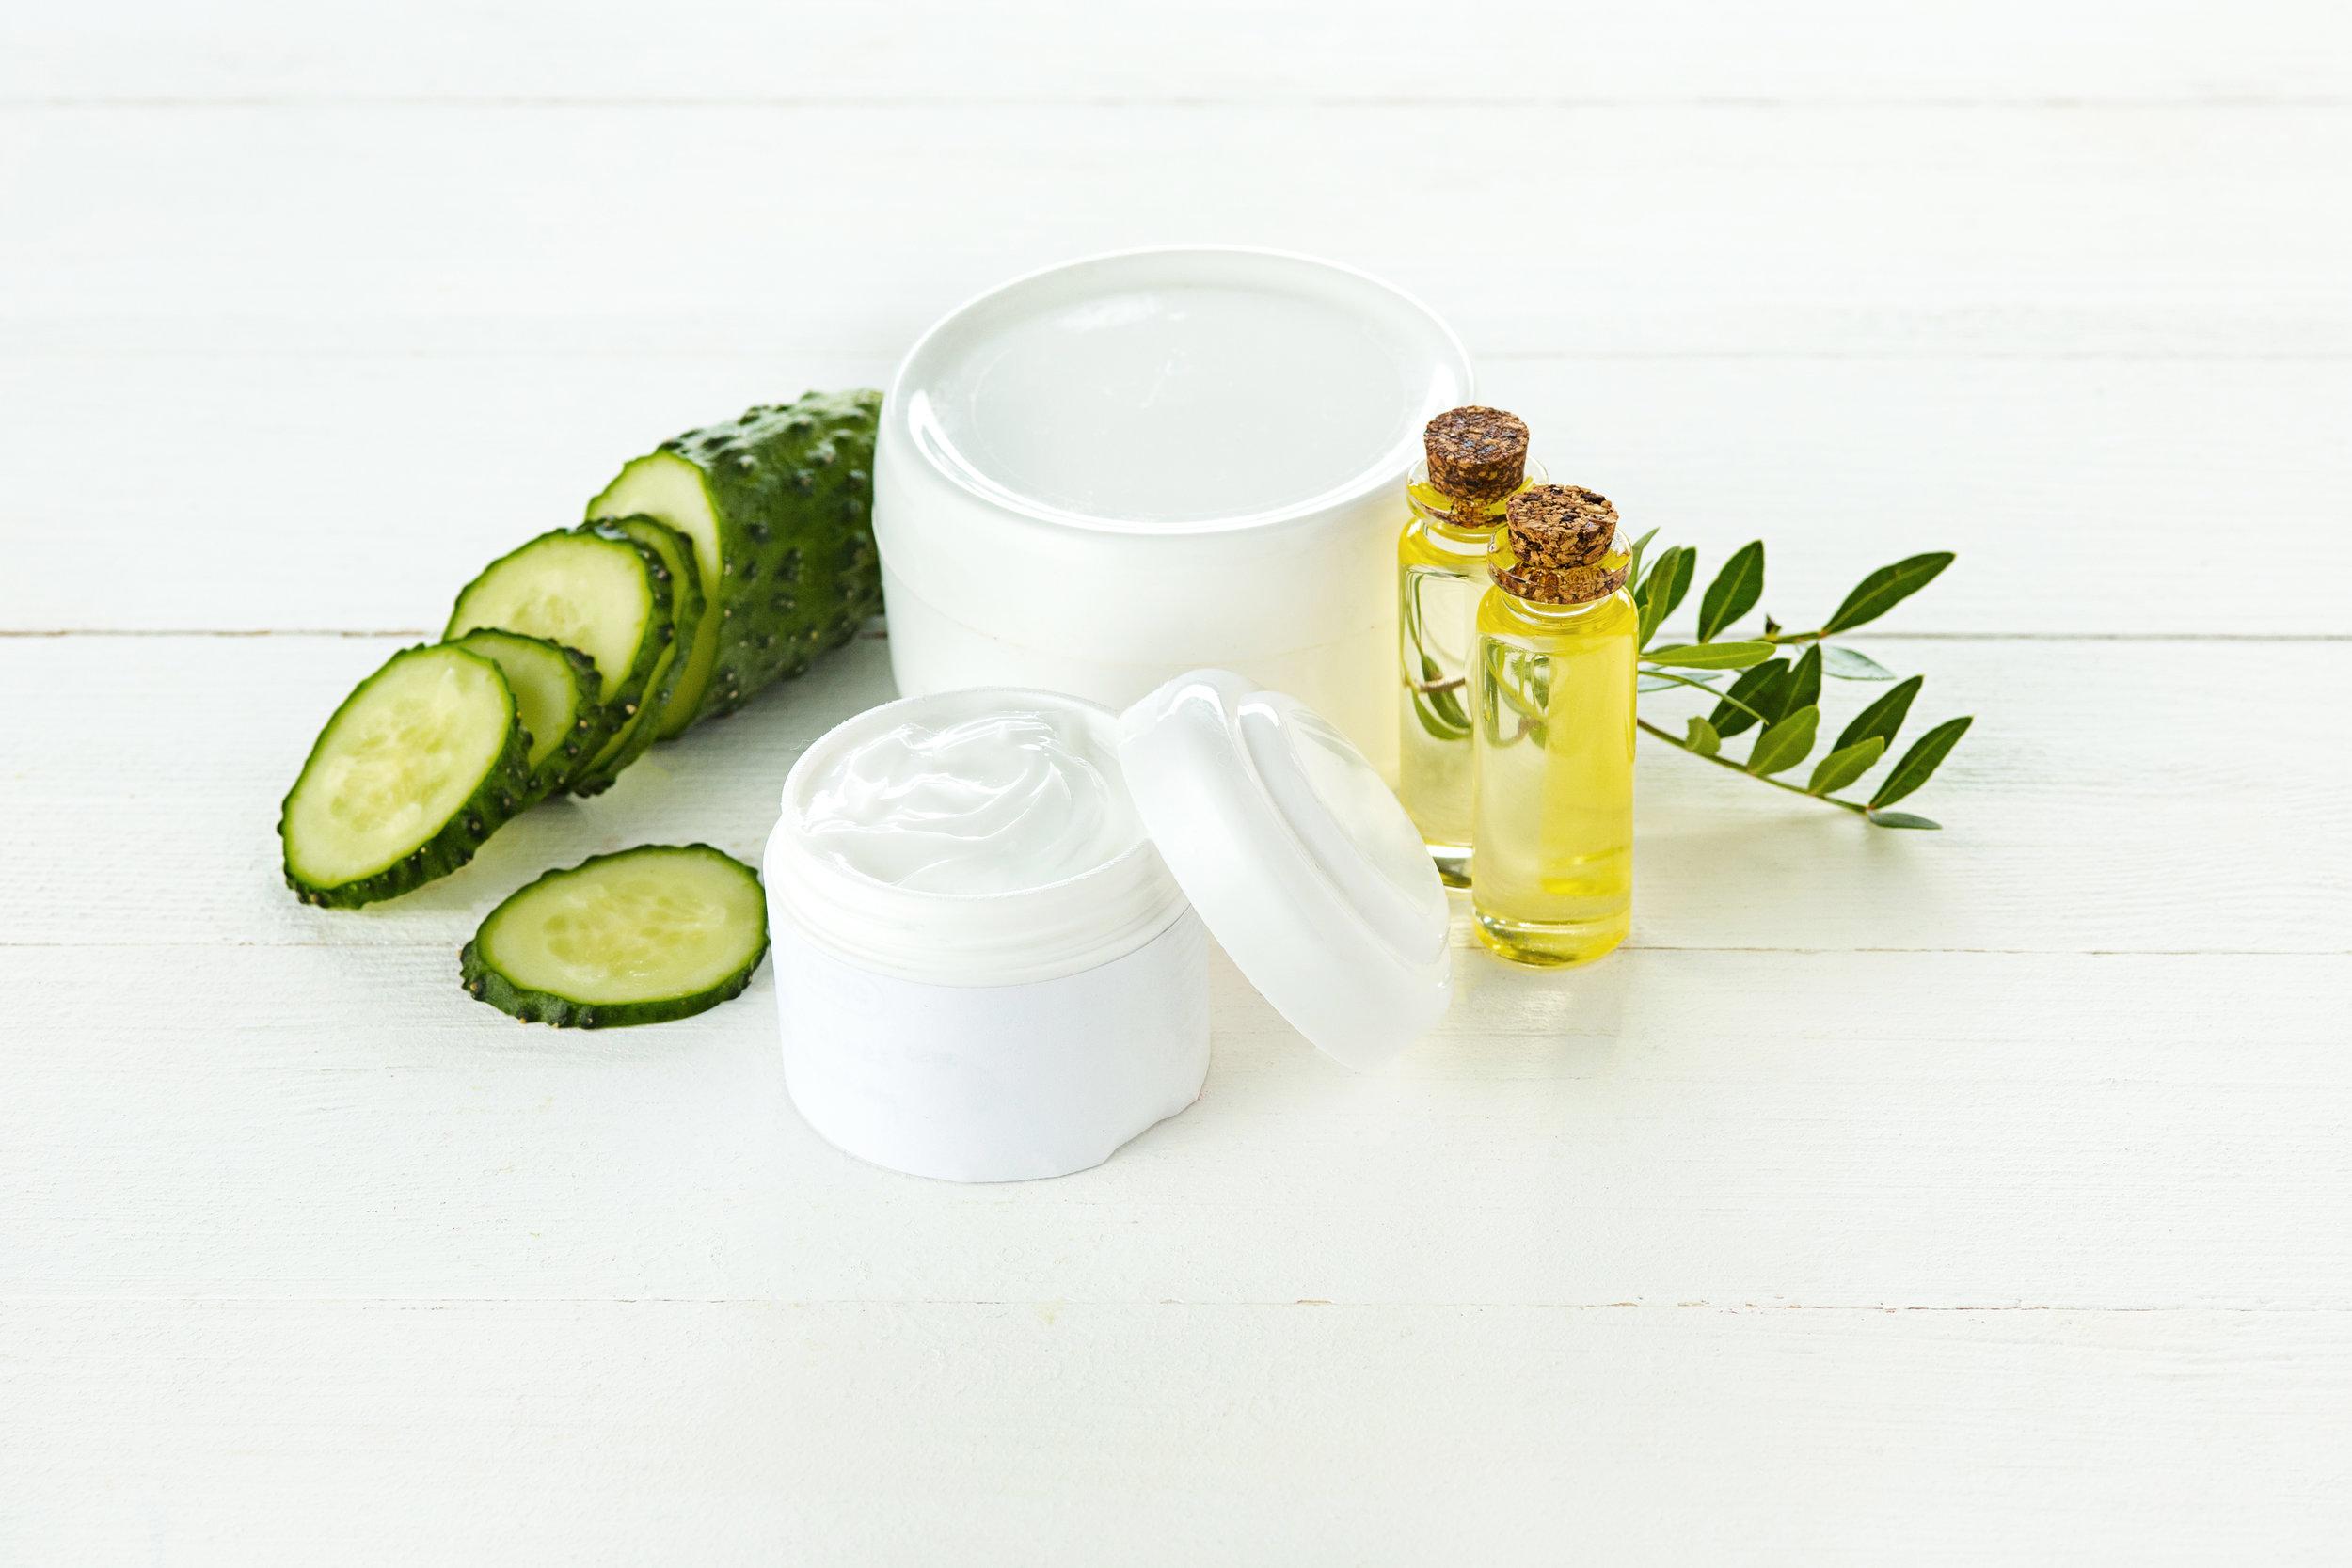 cucumber-and-aloe-cosmetic-cream-face-skin-and-P68G9B5.jpg